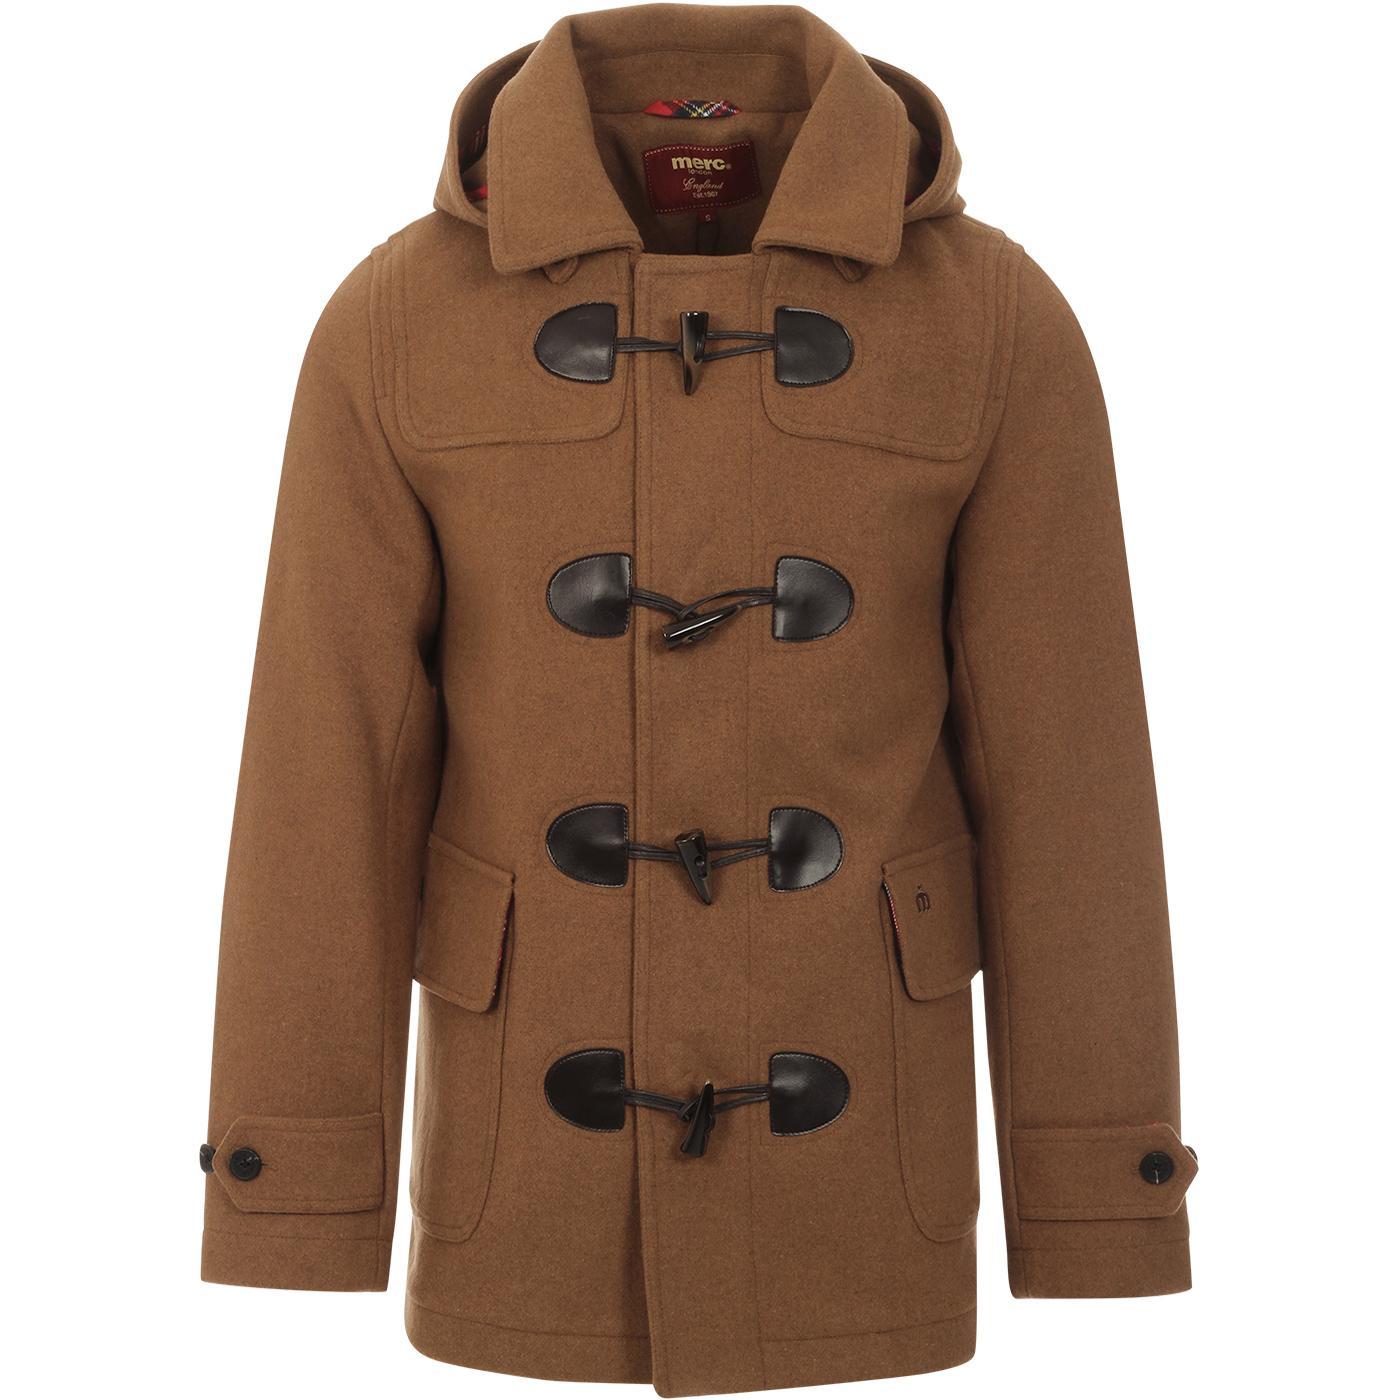 Bonner MERC Retro Mod Melton Duffle Coat (Tan)